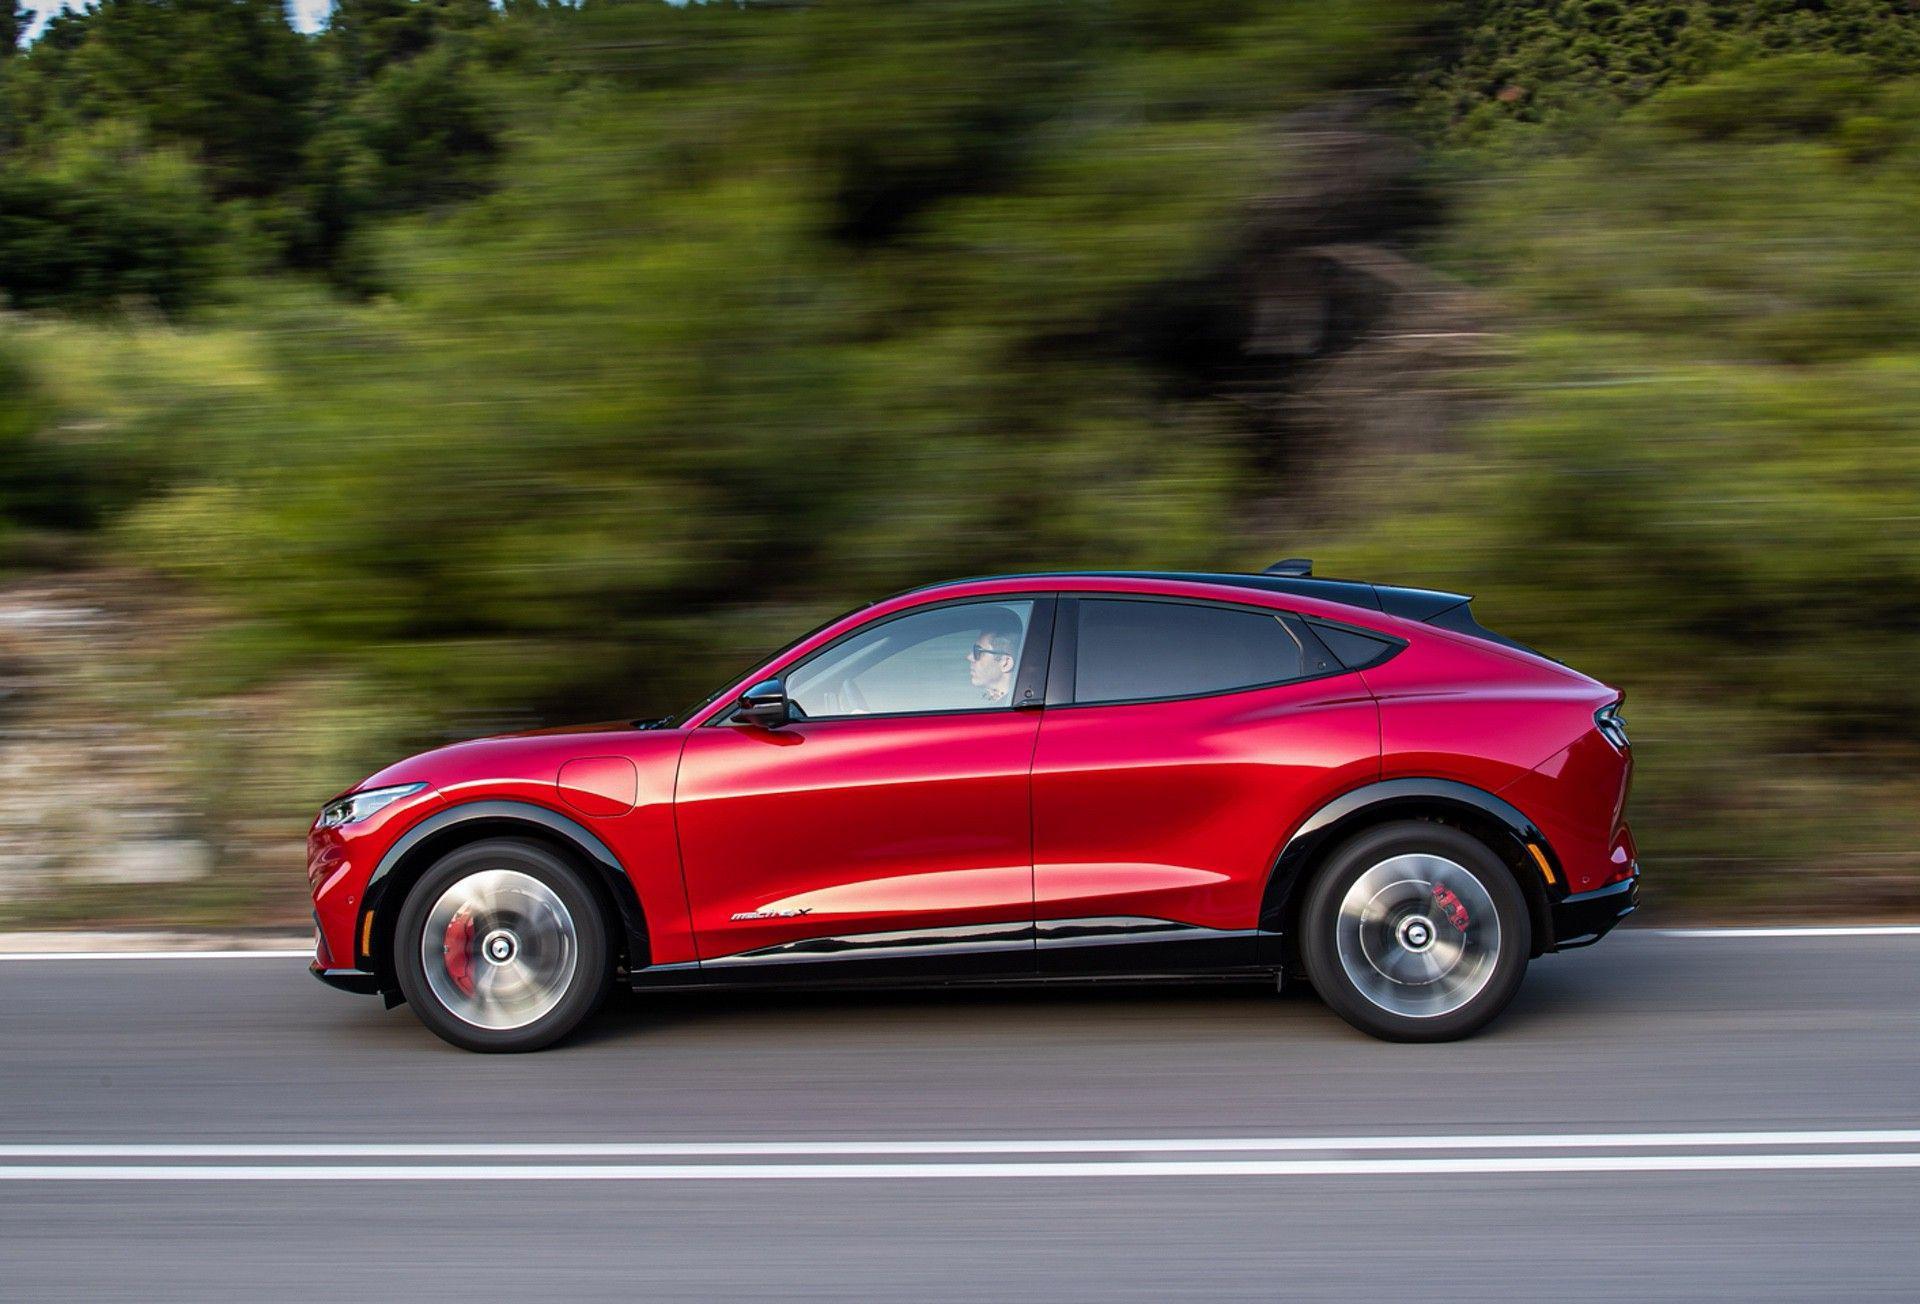 Ford_Mustang_Mach-E_greek_presskit-0118